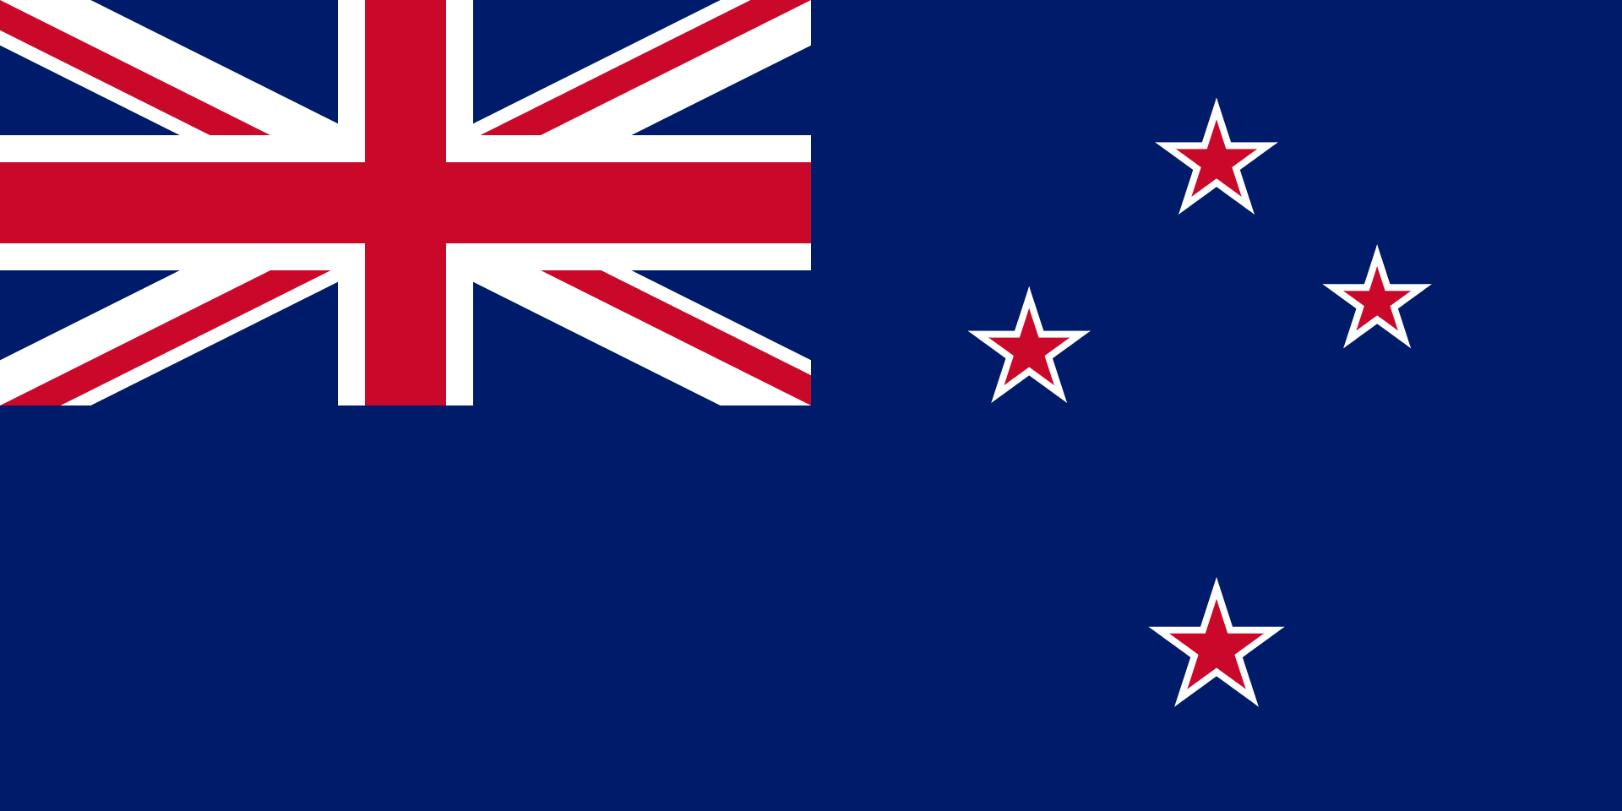 Flagge im Querformat Land Neuseeland 150x100 cm